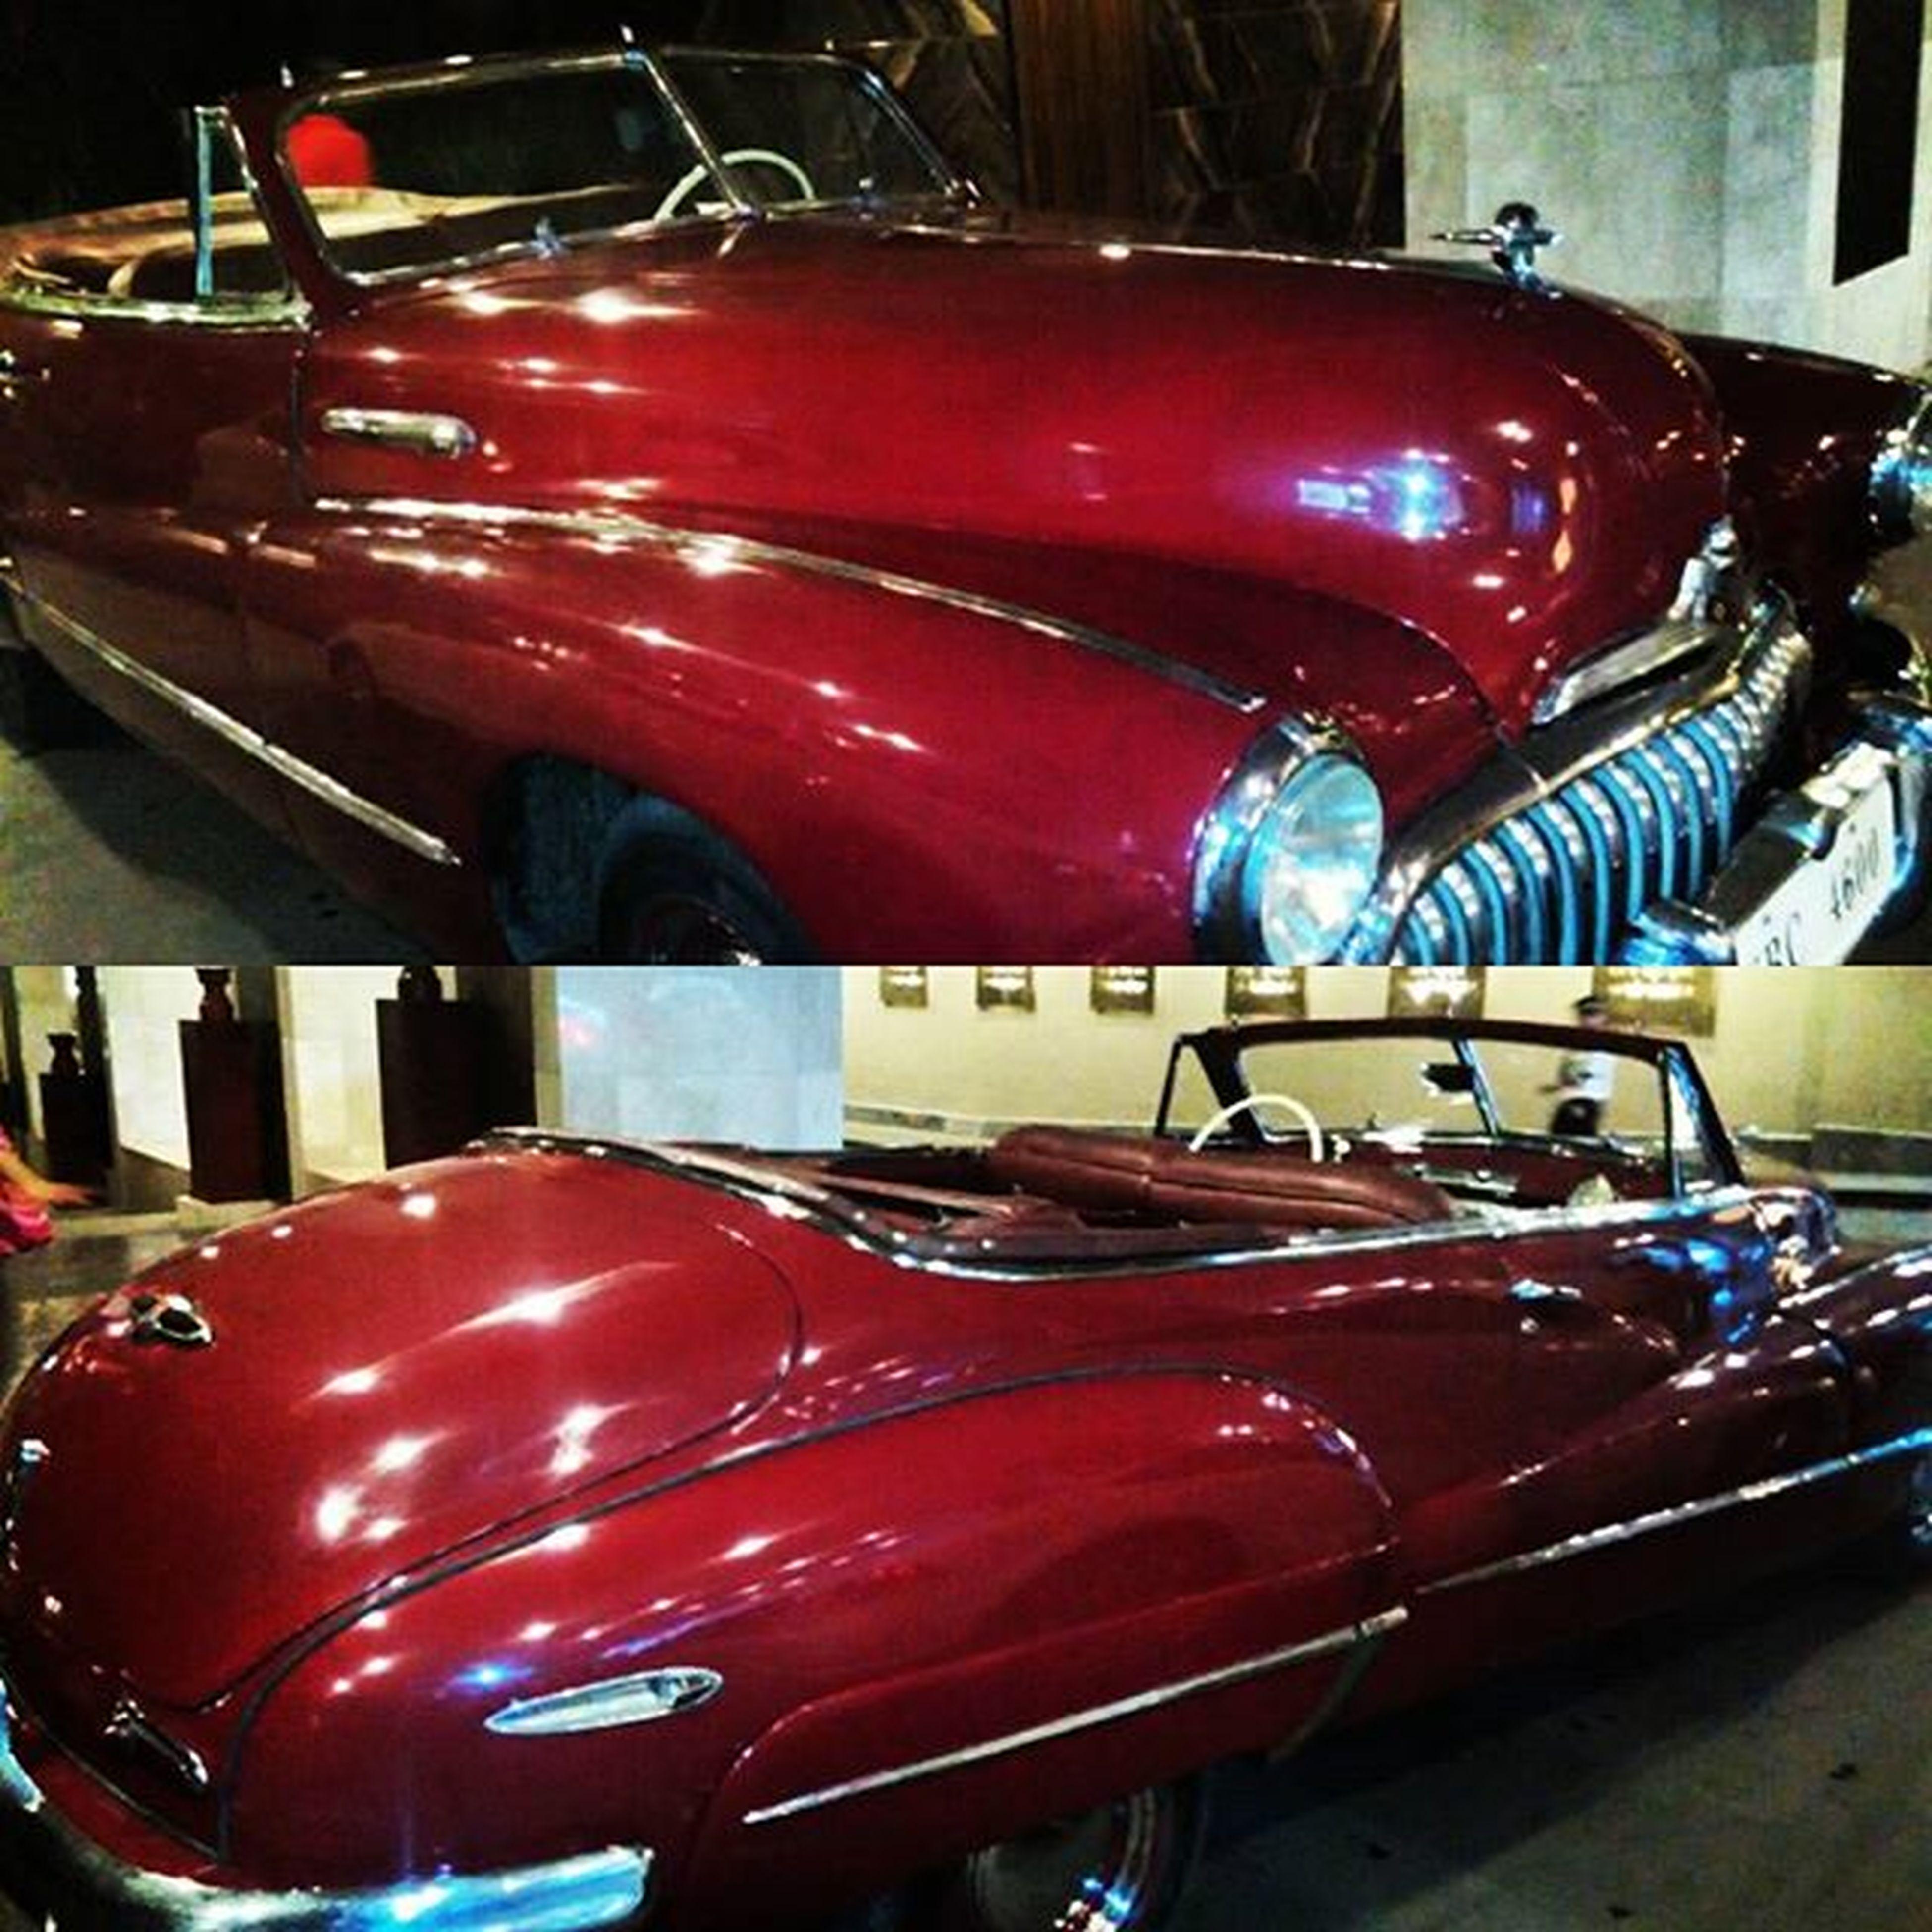 Vintage Classiccar Event Luxury Priceless